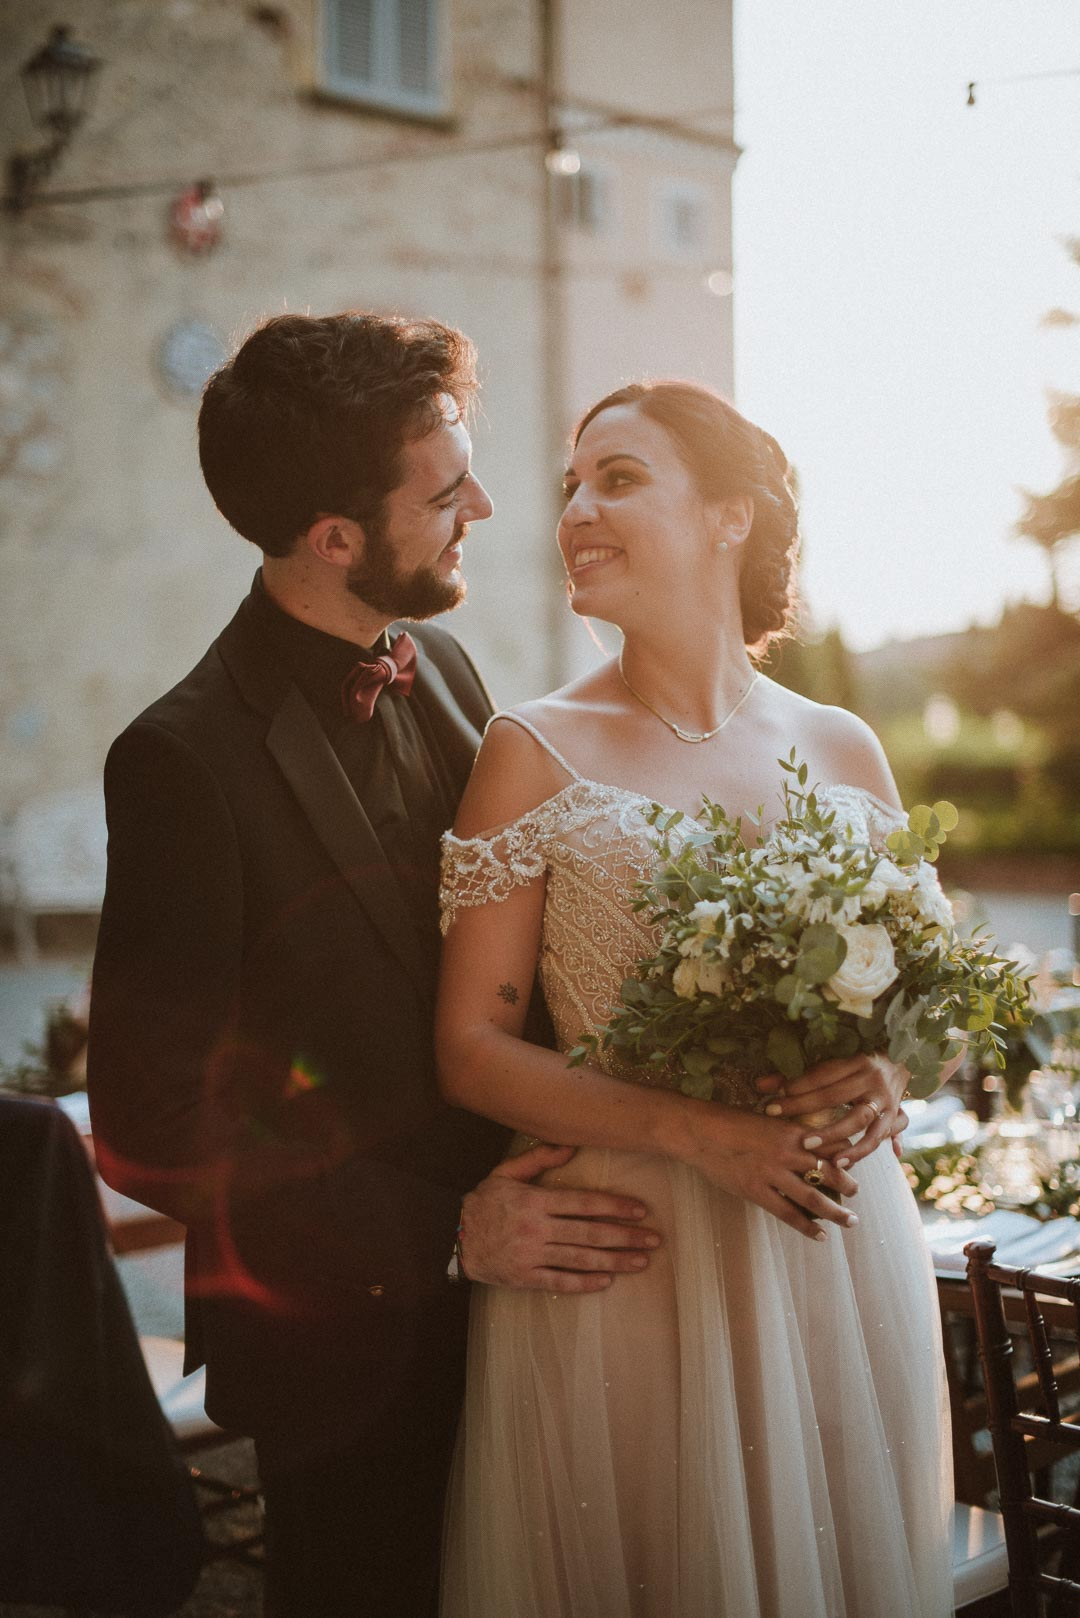 wedding-photographer-destination-fineart-bespoke-reportage-tuscany-villascorzi-vivianeizzo-spazio46-131